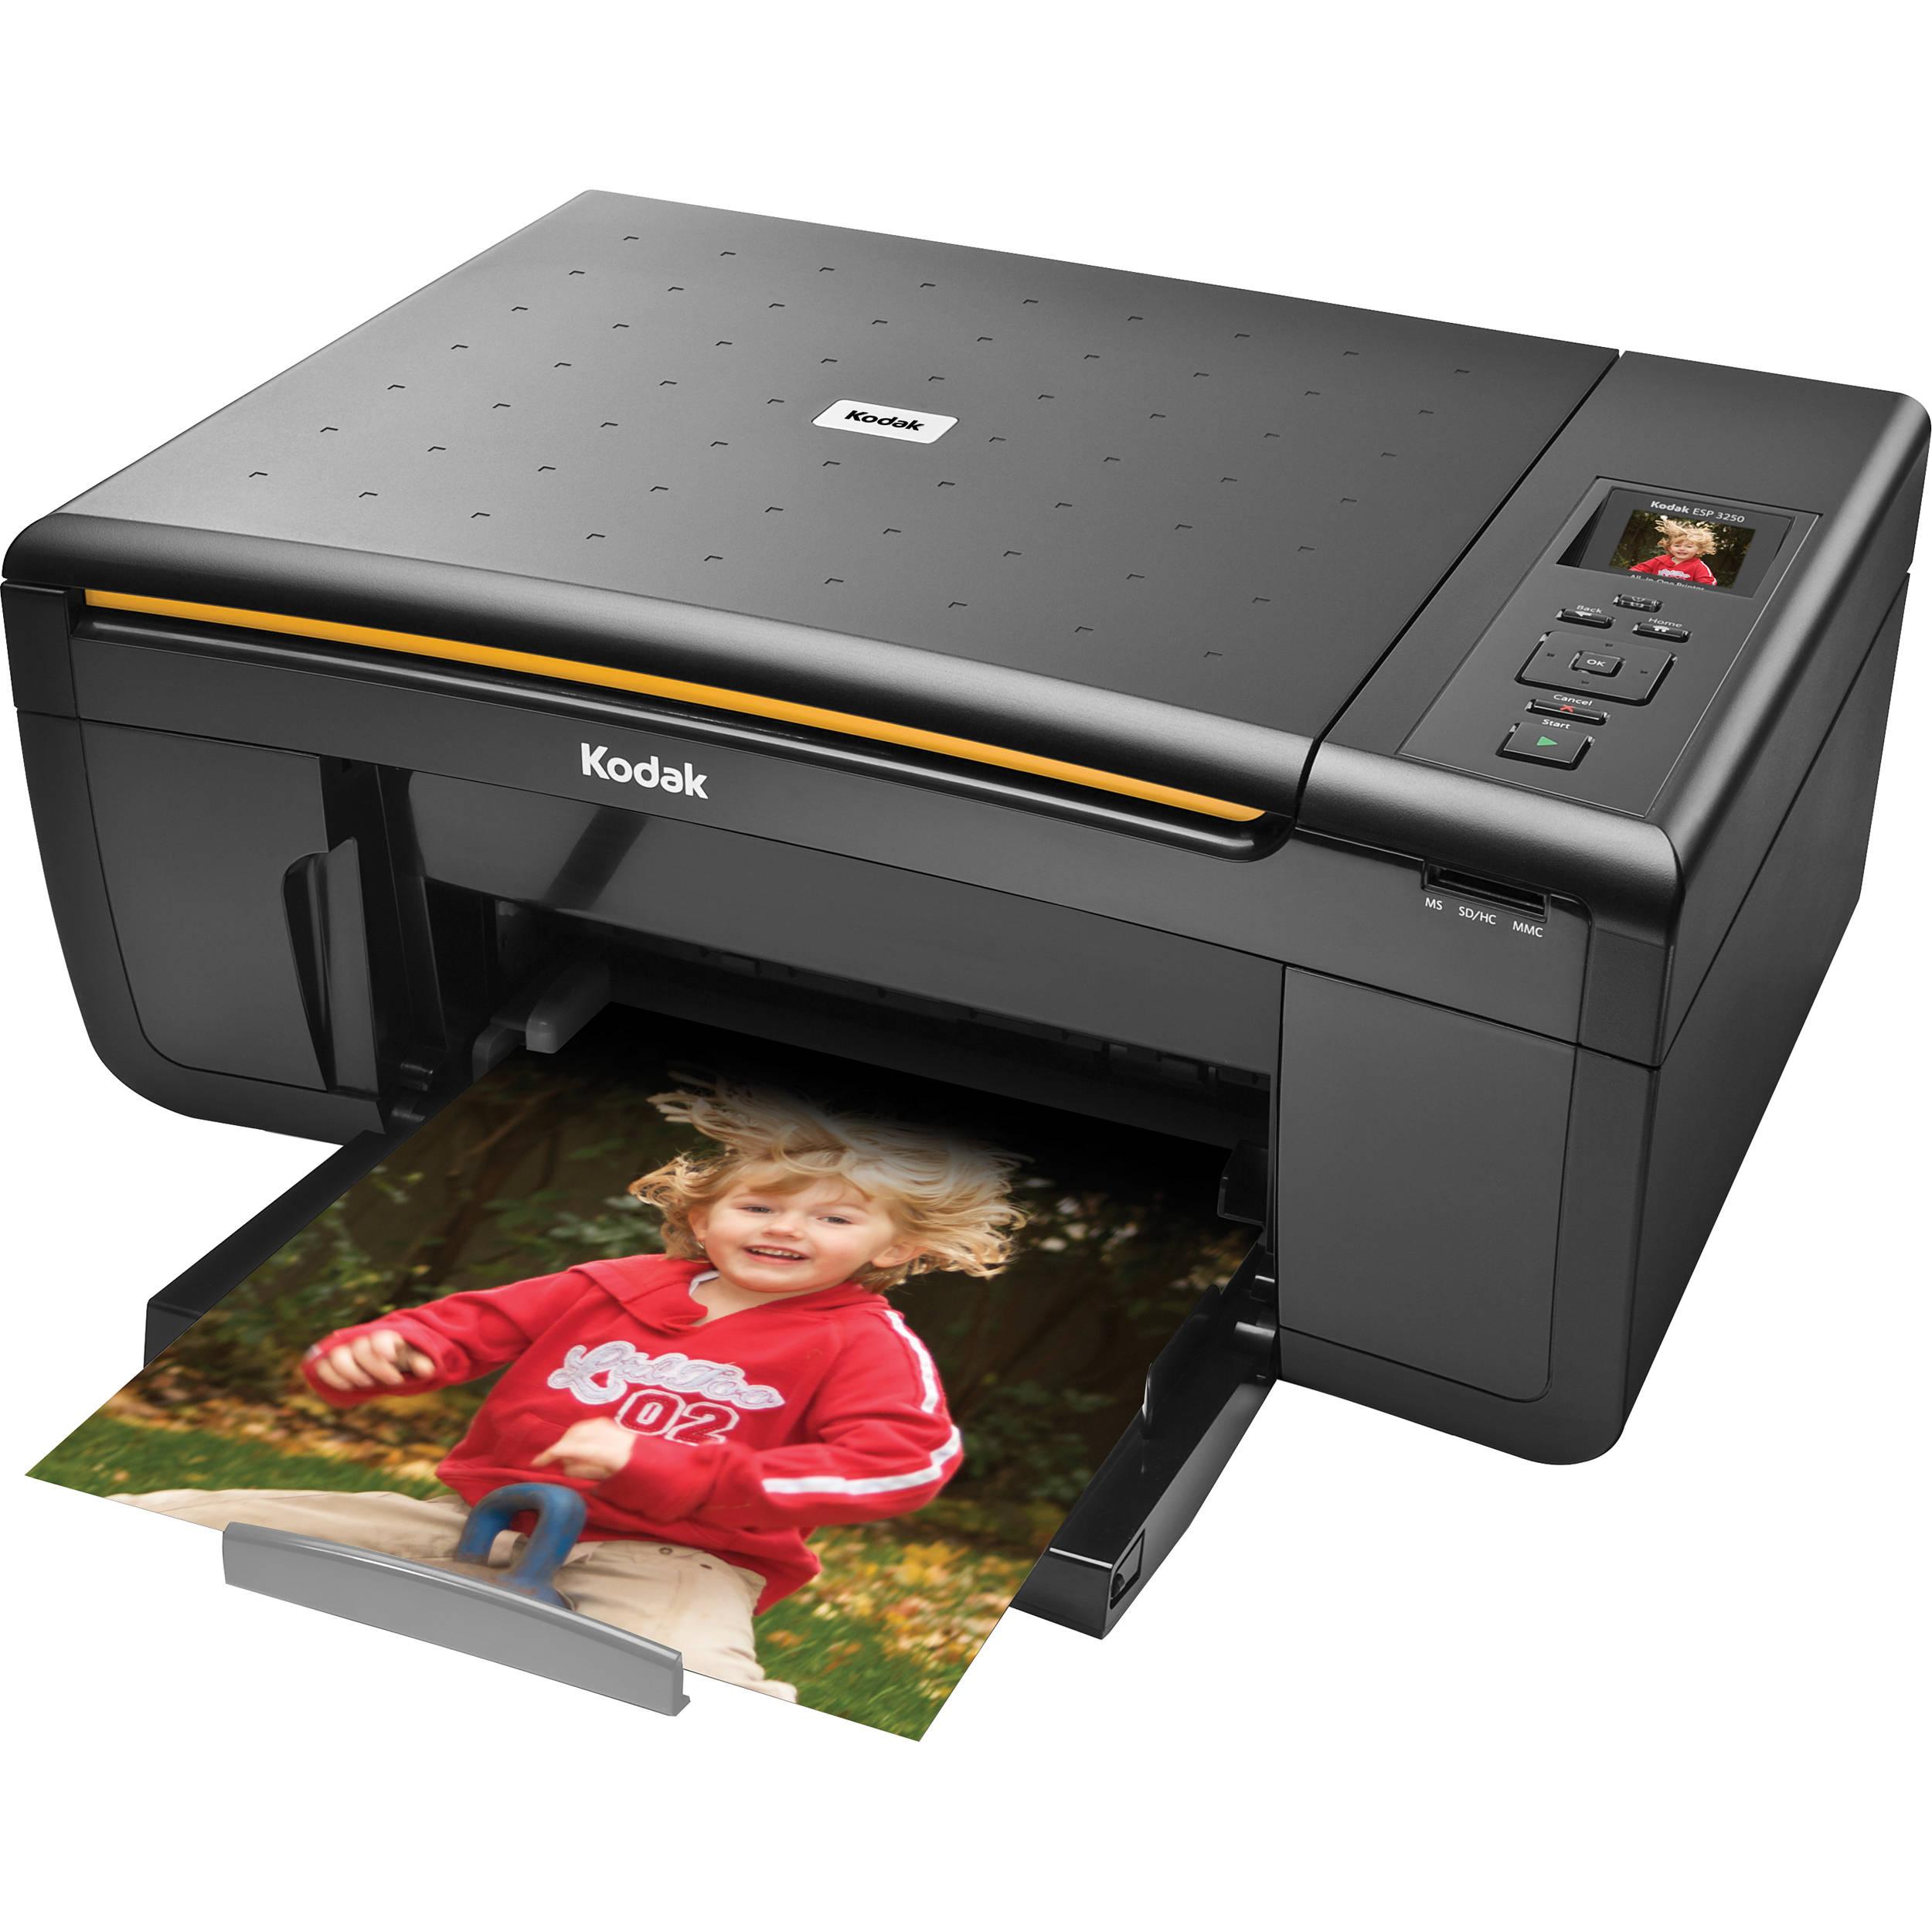 kodak esp 3250 all in one inkjet printer 8946139 b h photo video rh bhphotovideo com kodak esp 3250 manual pdf kodak esp 3250 printer software